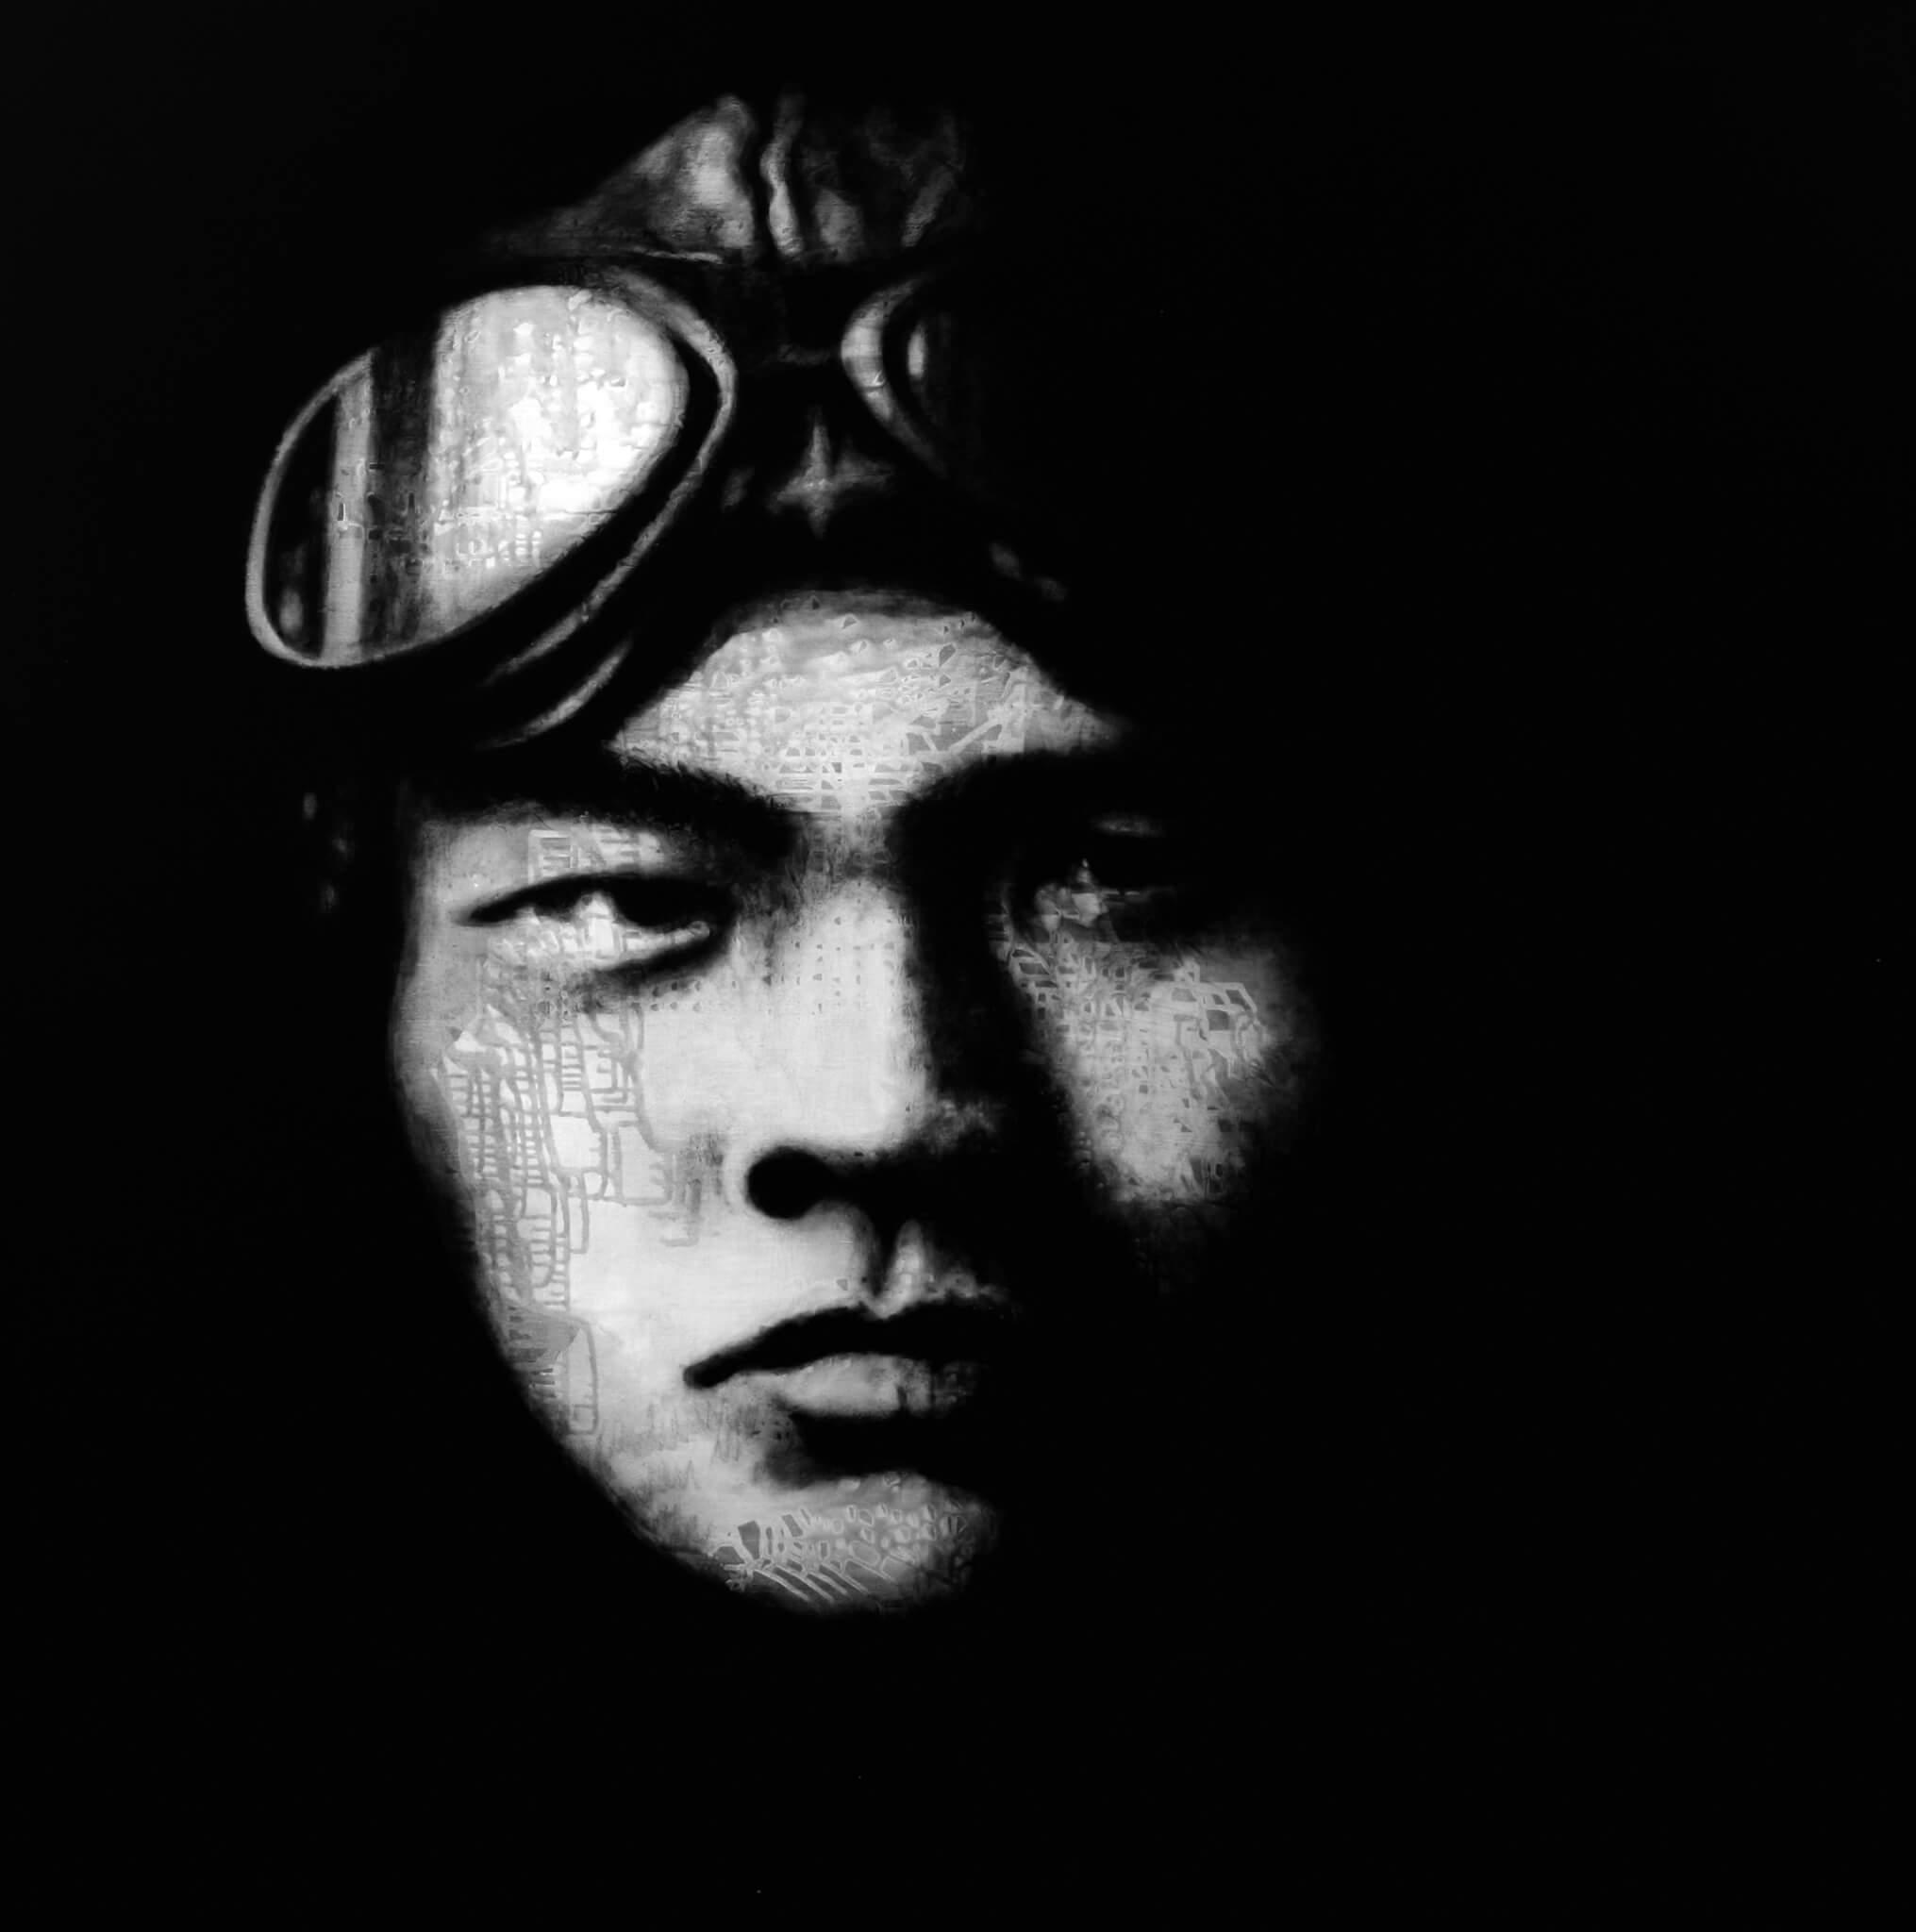 Kamikaze II, 2010